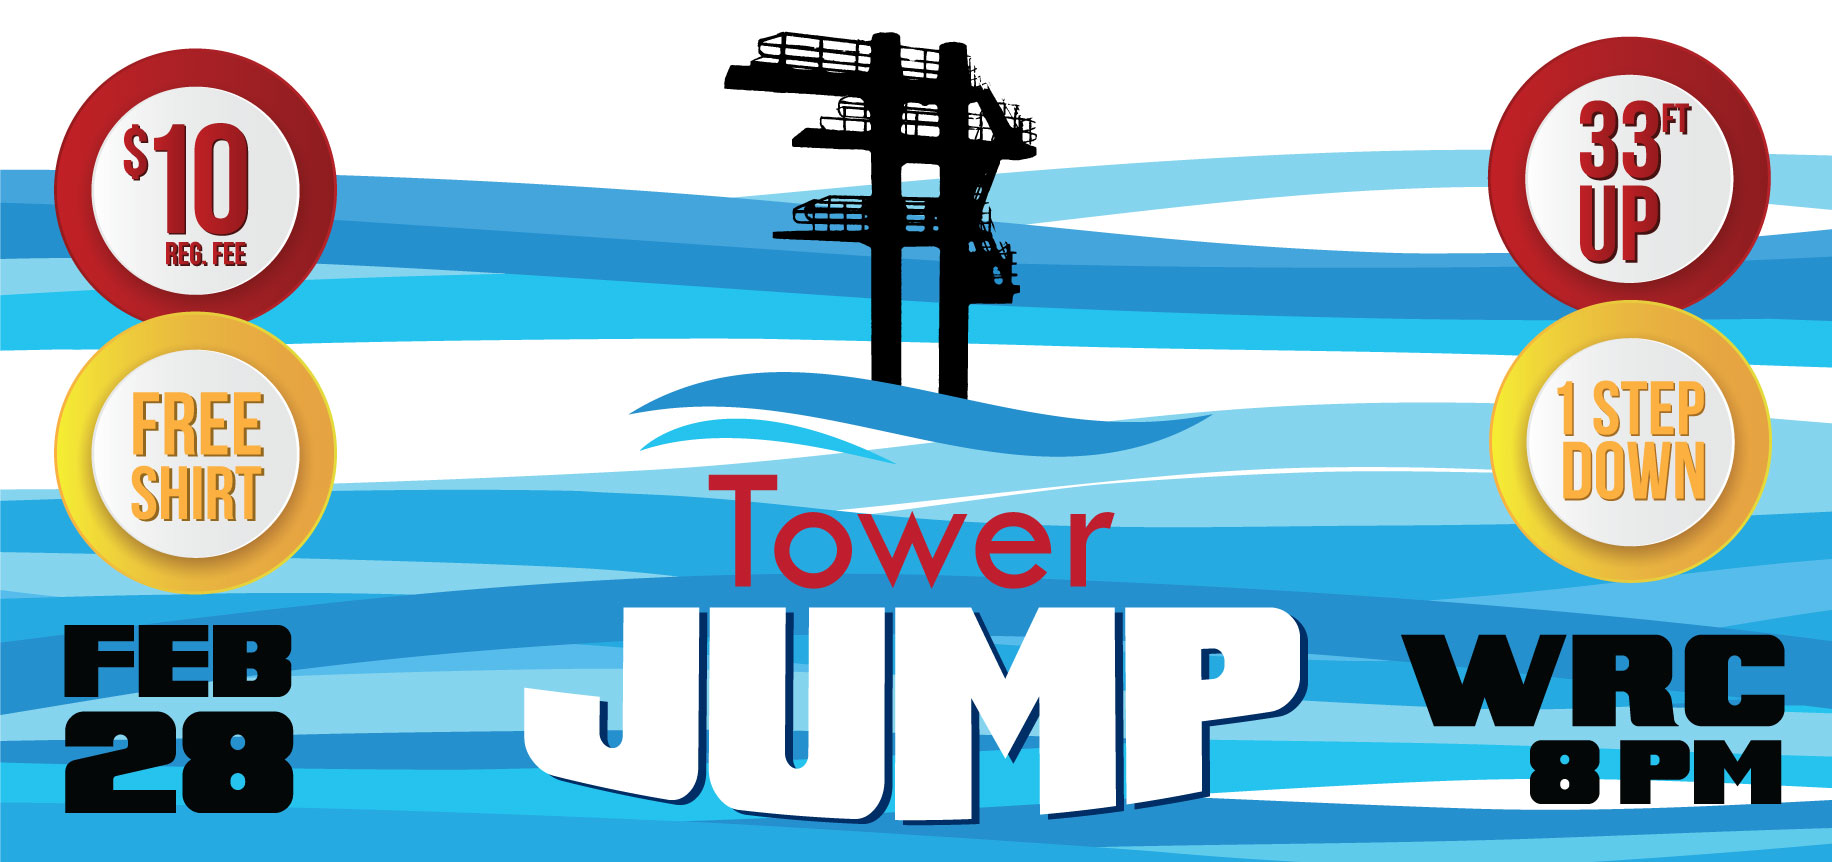 TowerJump_WebBanner_S18